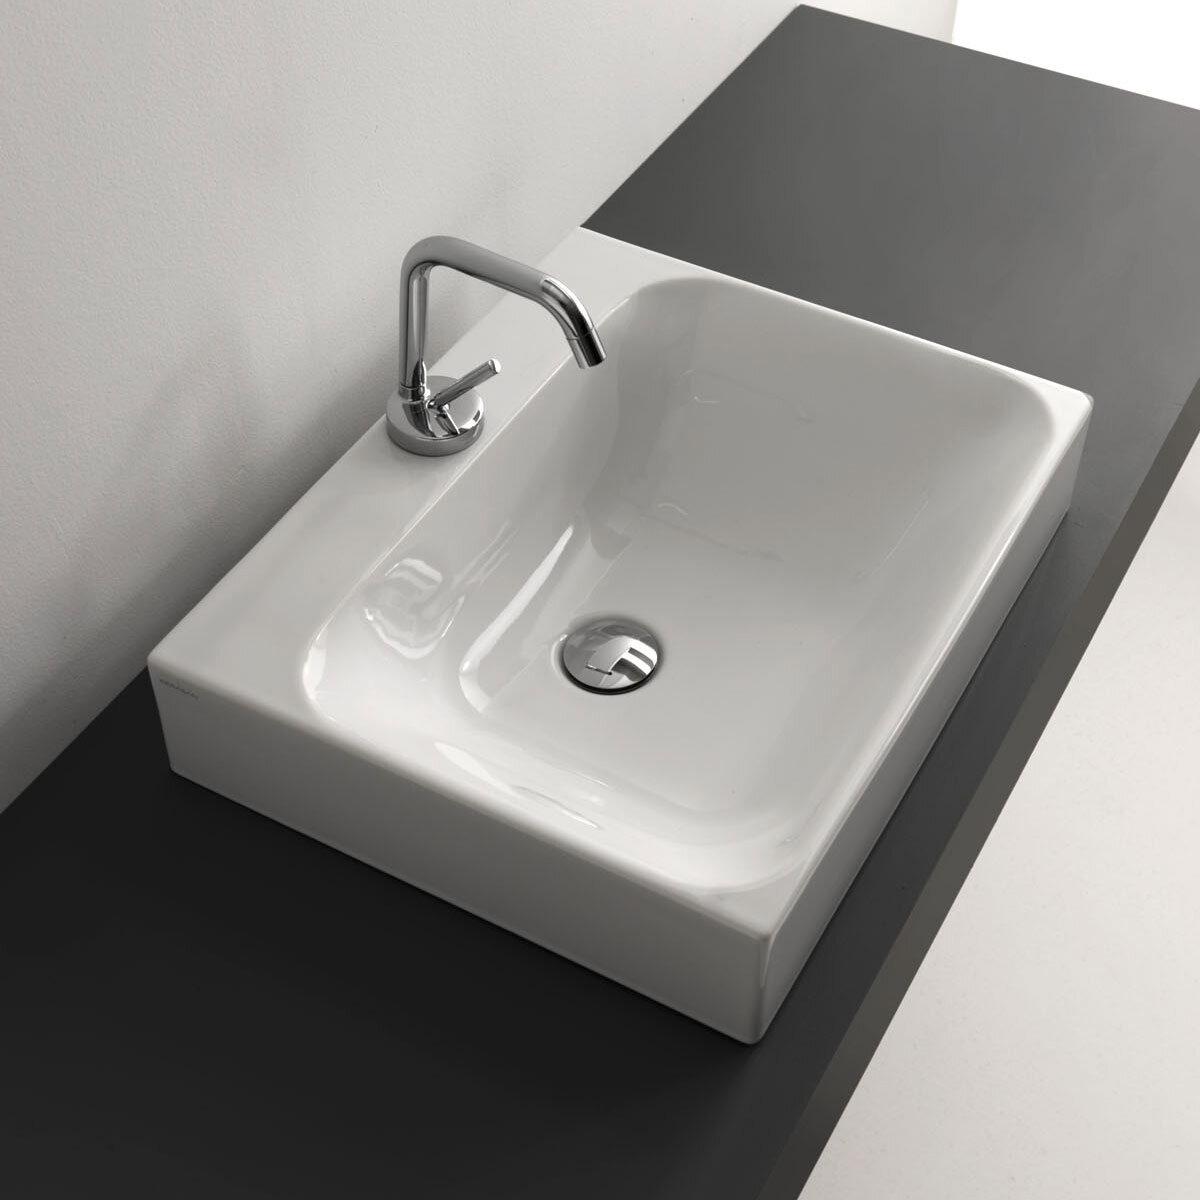 Ws Bath Collections Cento Ceramic Ceramic Rectangular Vessel Bathroom Sink With Faucet Wayfair